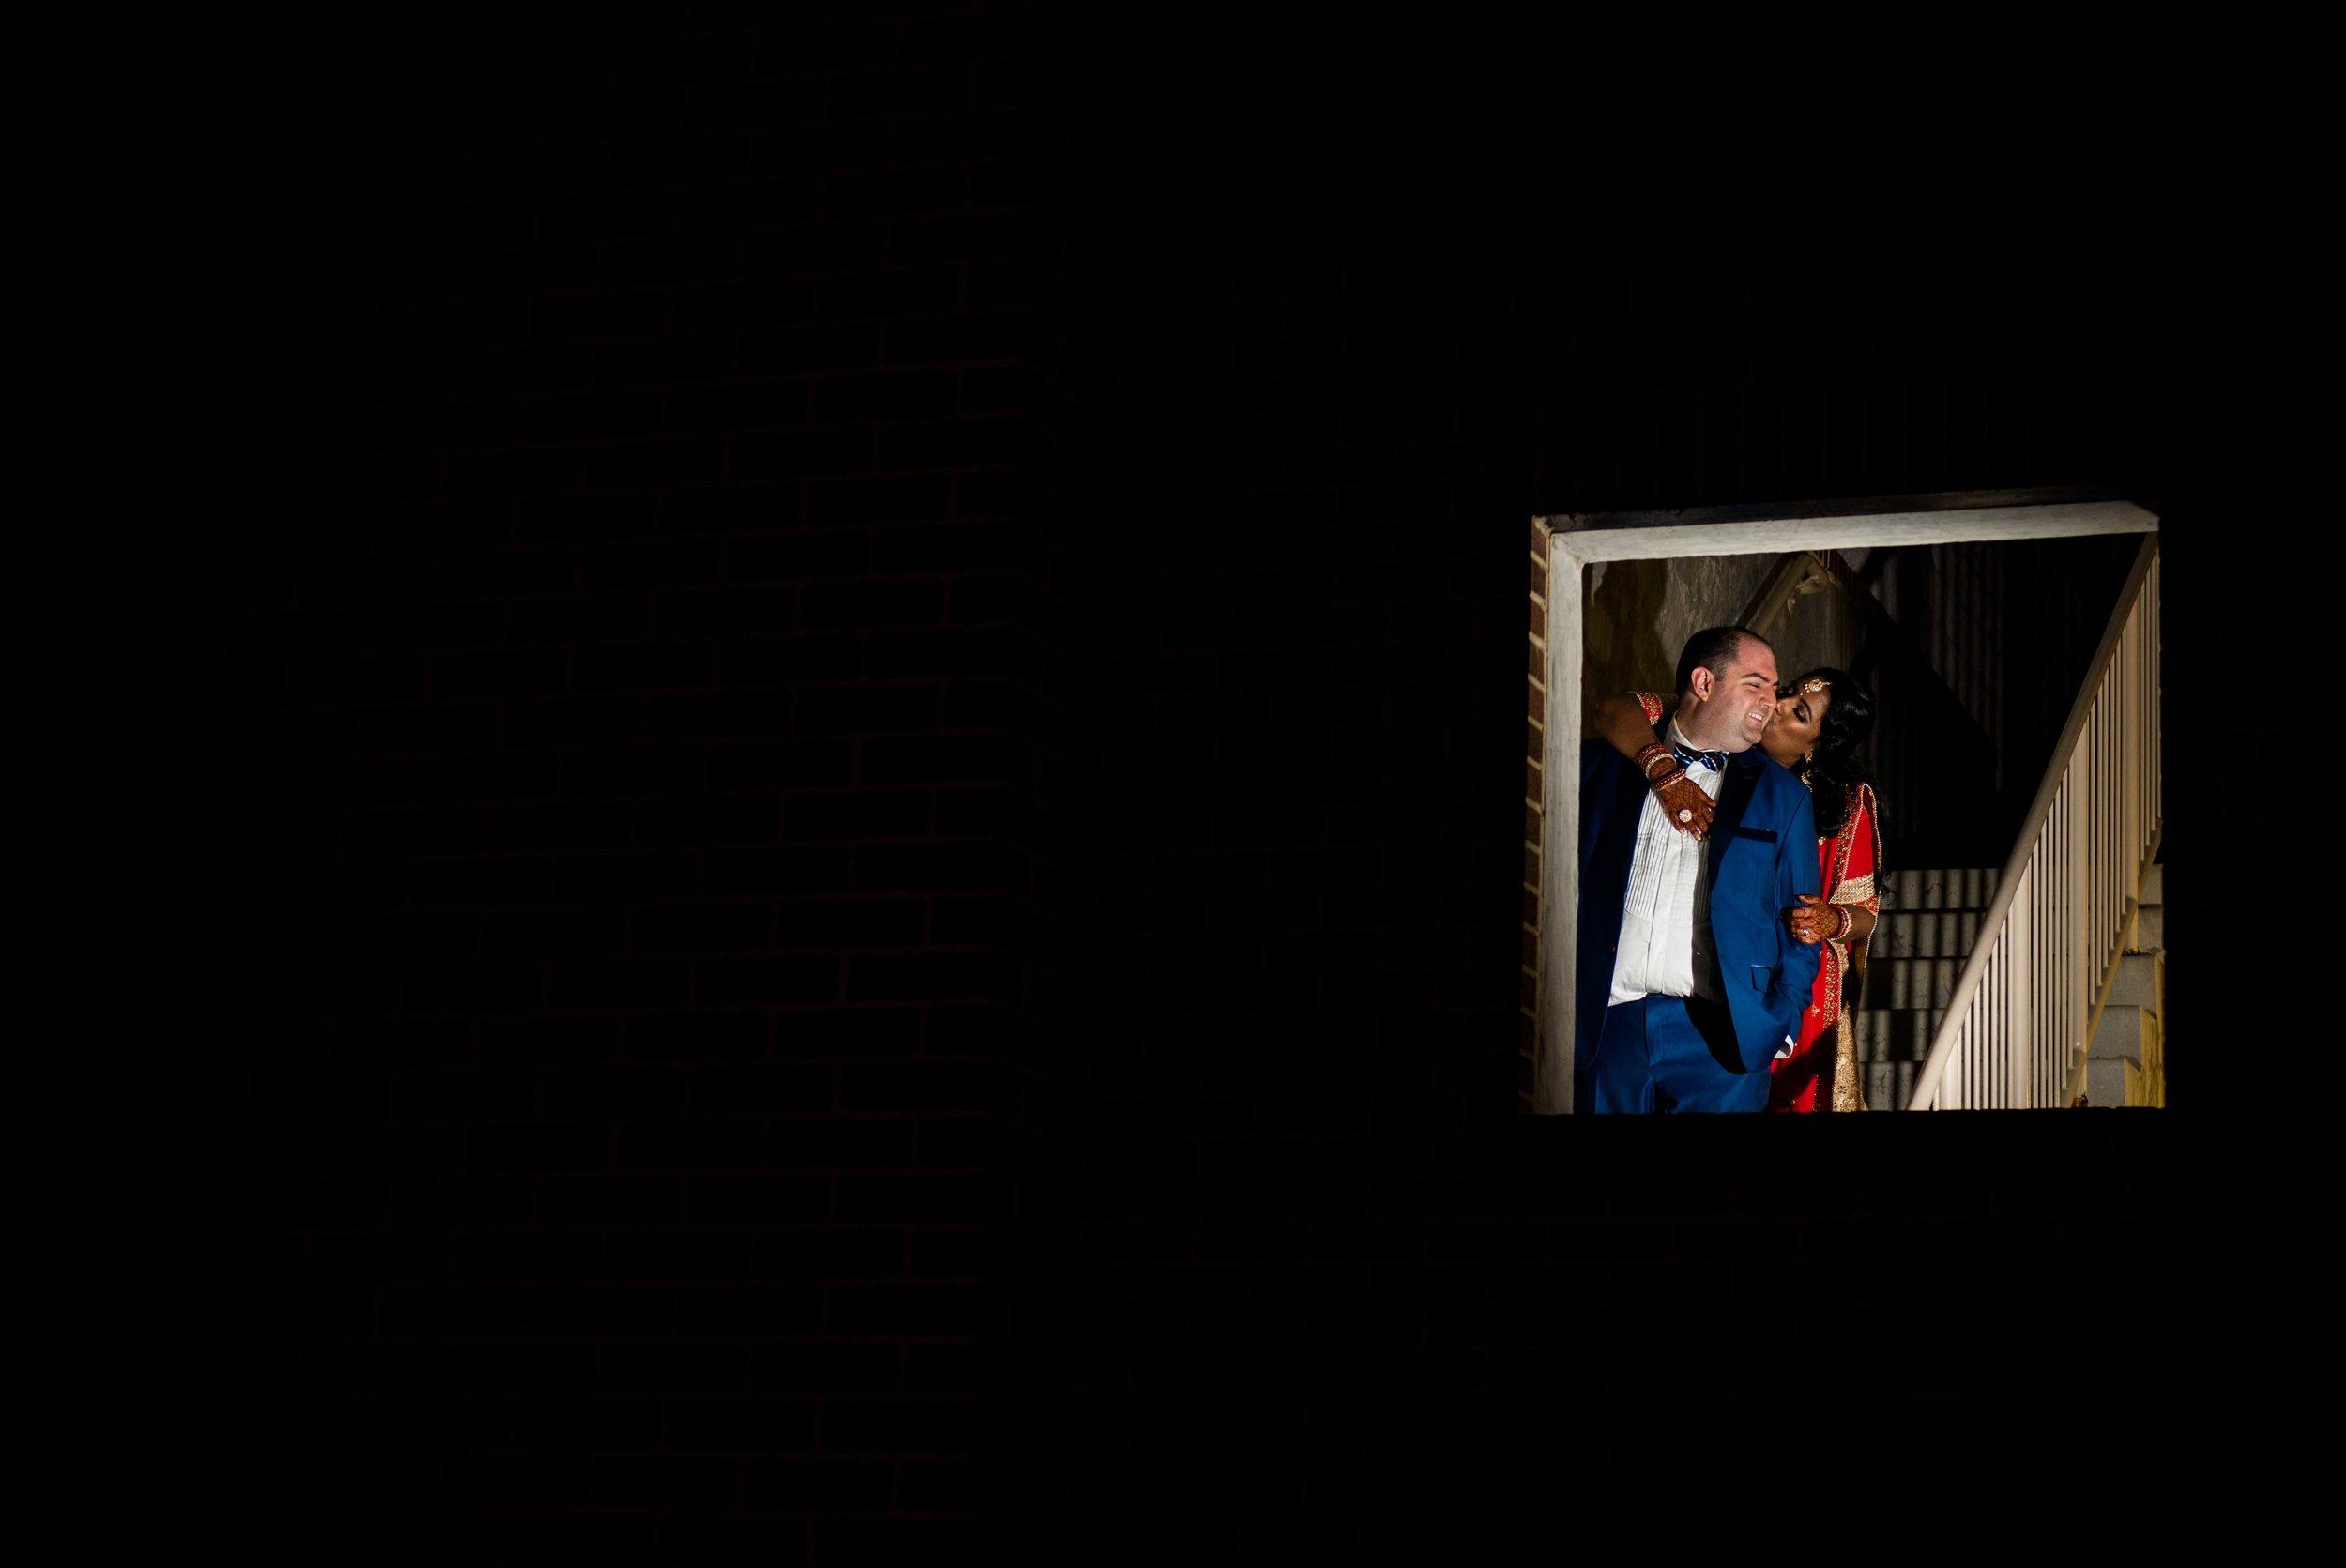 AlexandriaWedding-Blake&Sahaja-NightPhotos-42.jpg